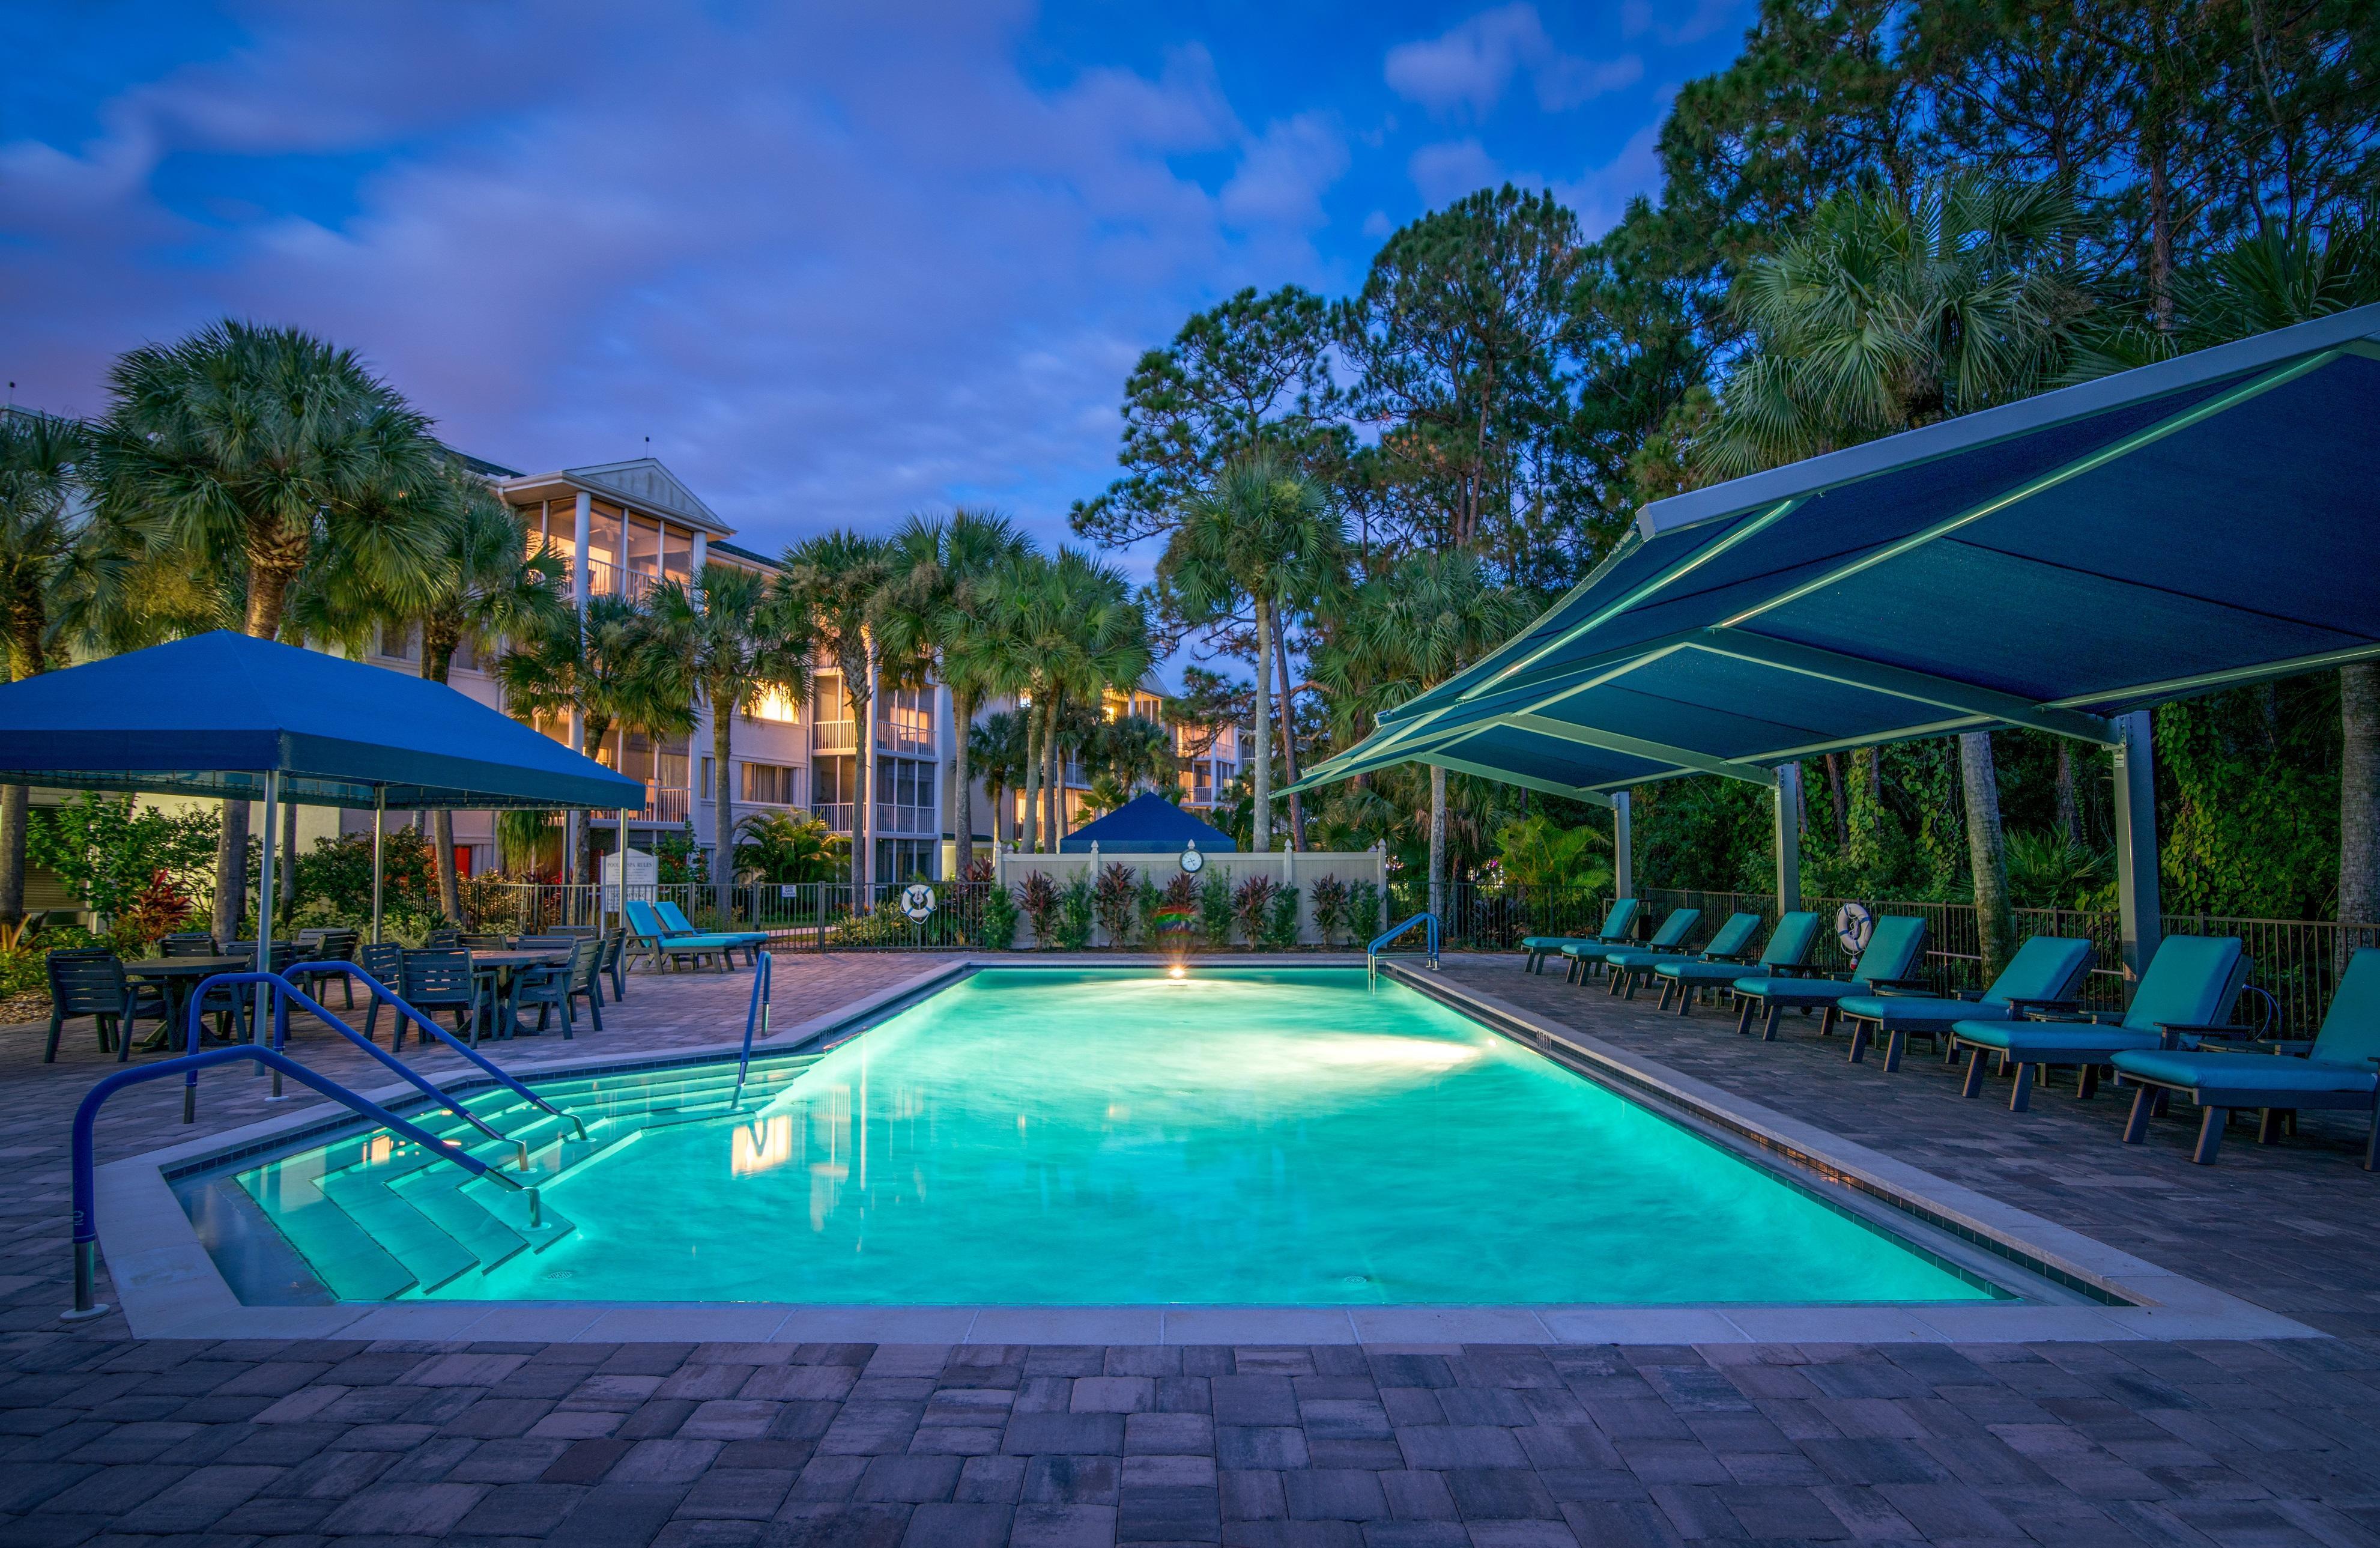 Aviva A Campus For Senior Life Sarasota Florida Fl